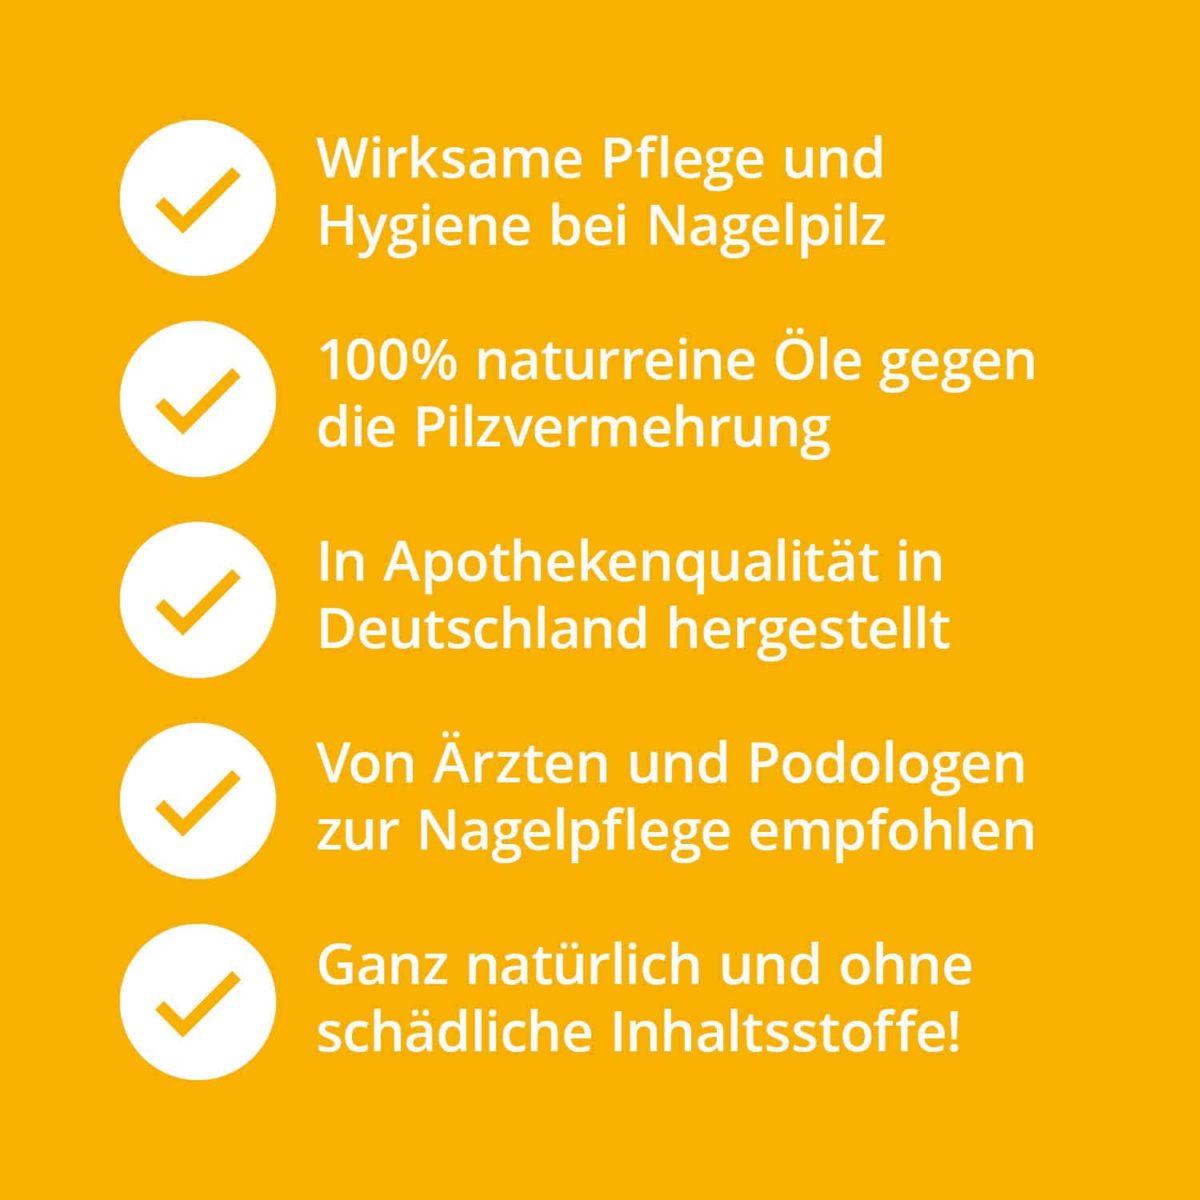 Casida Set 5 +1 Nagelöl Repair & Protect 10 ml PZN 10022445 Apotheke Nagelpilz Füße Hände (7)